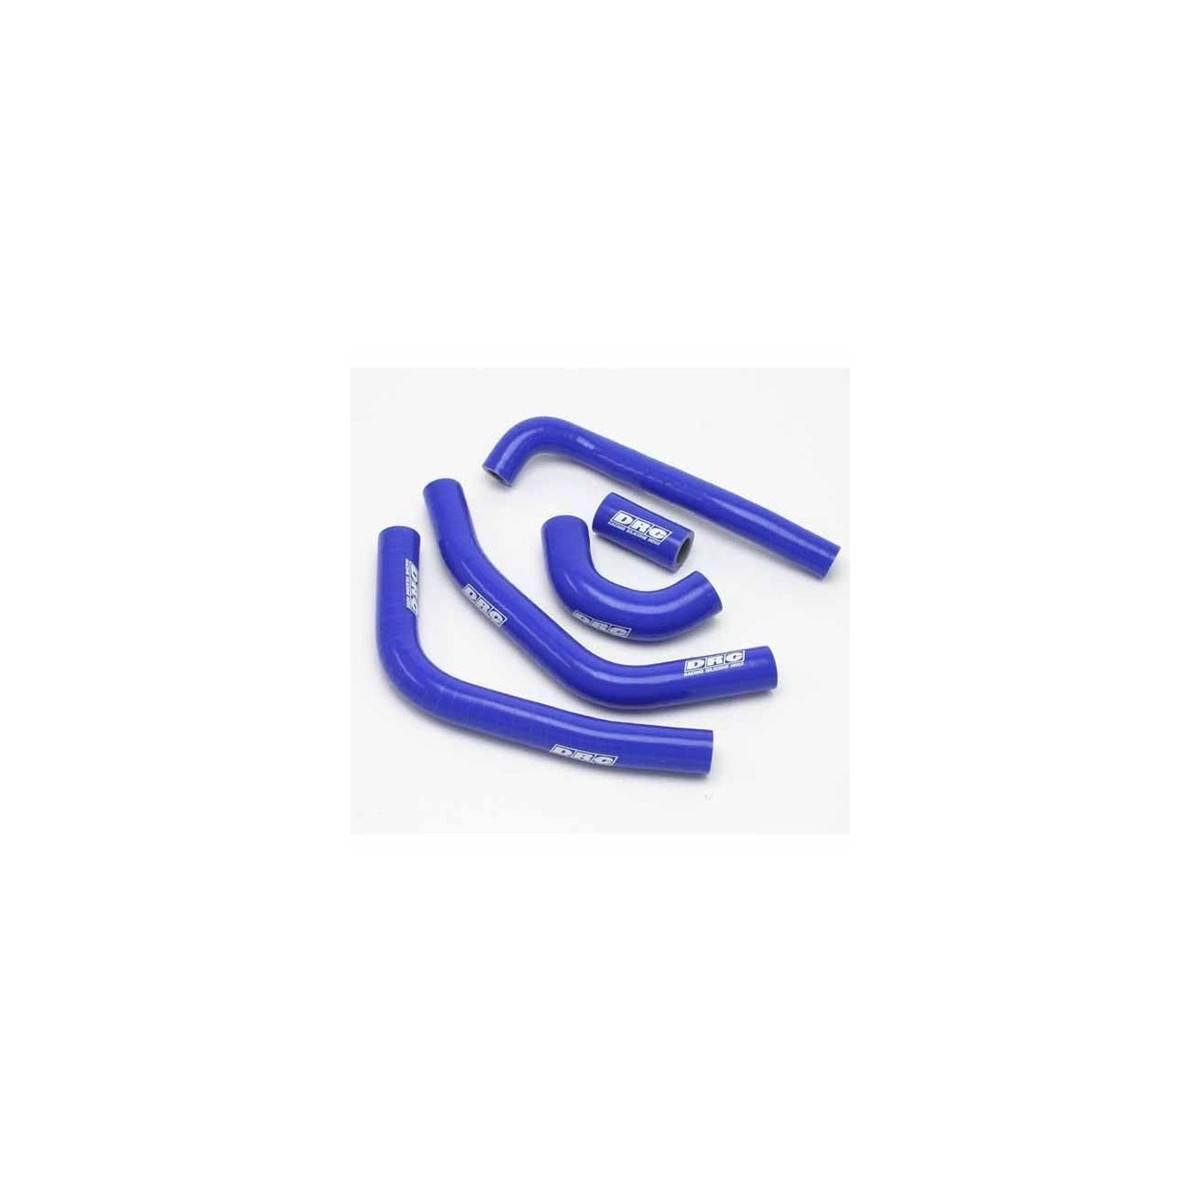 D47.01.873 - Kit Manguitos Radiador Husqvarna Fc450´16- Azul